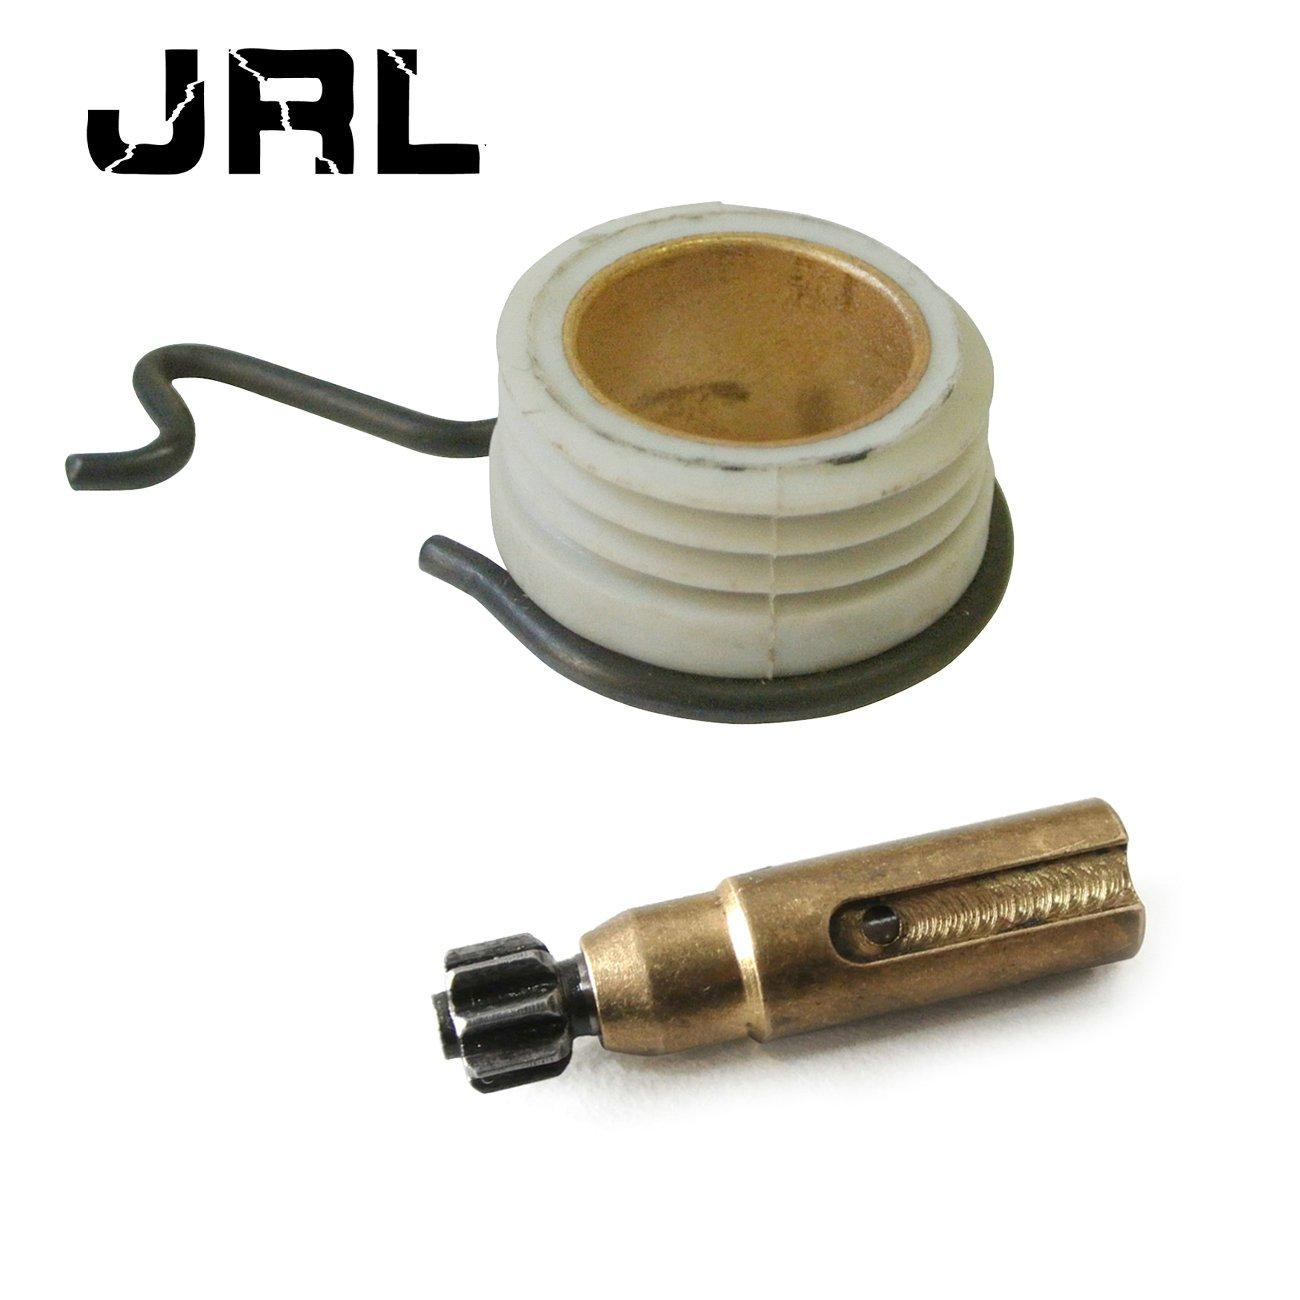 Jrl NEUF Pompe à huile Oiler pour Stihl 021023025MS210MS230MS250tronçonneuse Huang Machinery